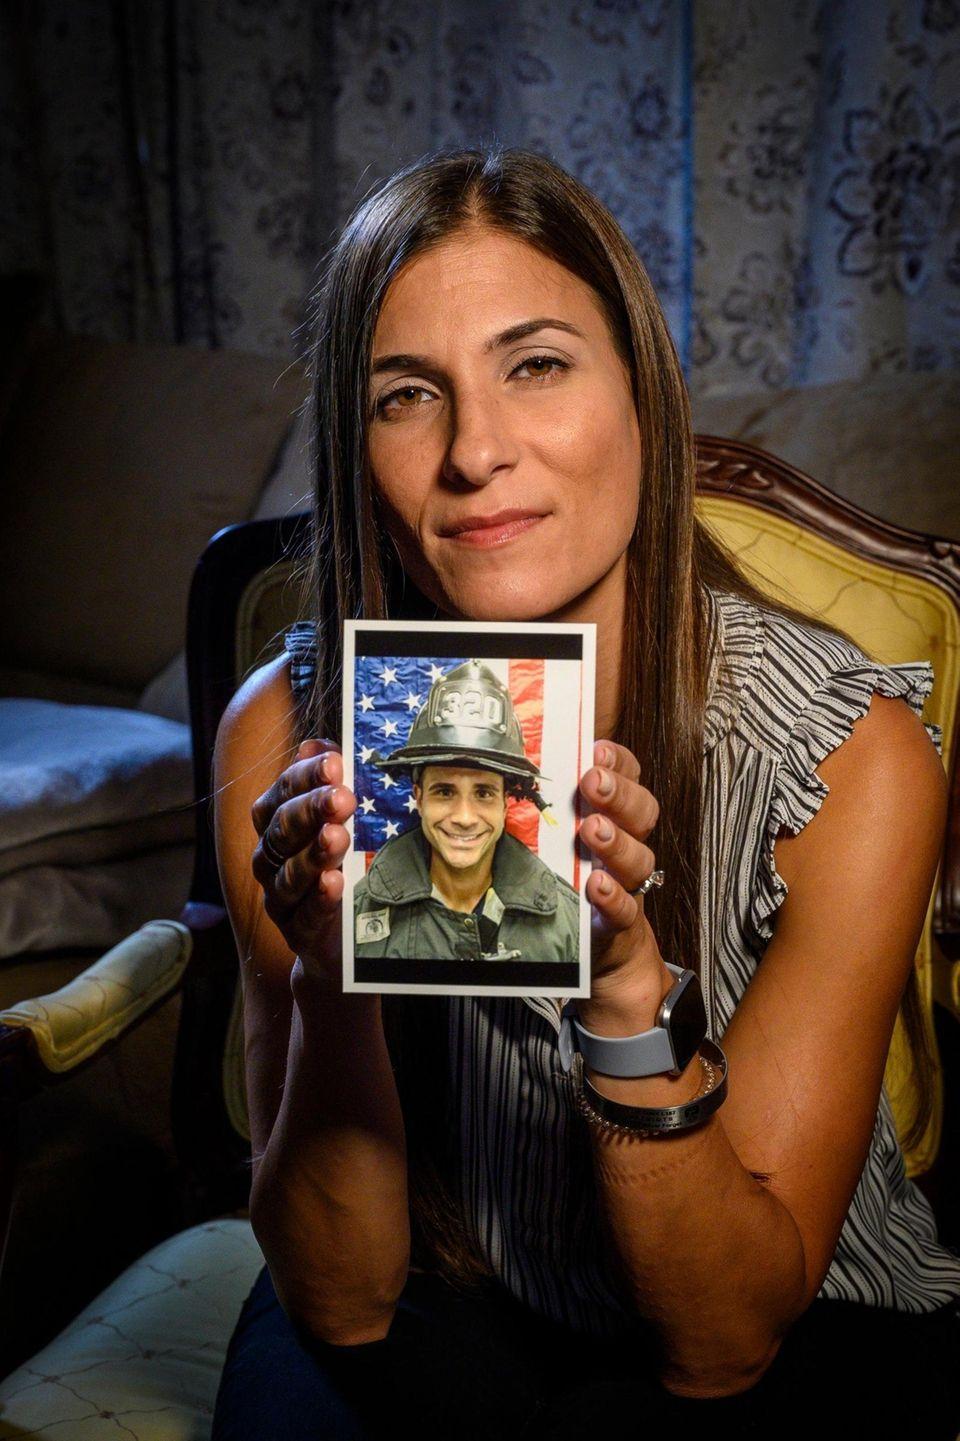 Miriam Espinal, 38, of Glen Cove, holding a